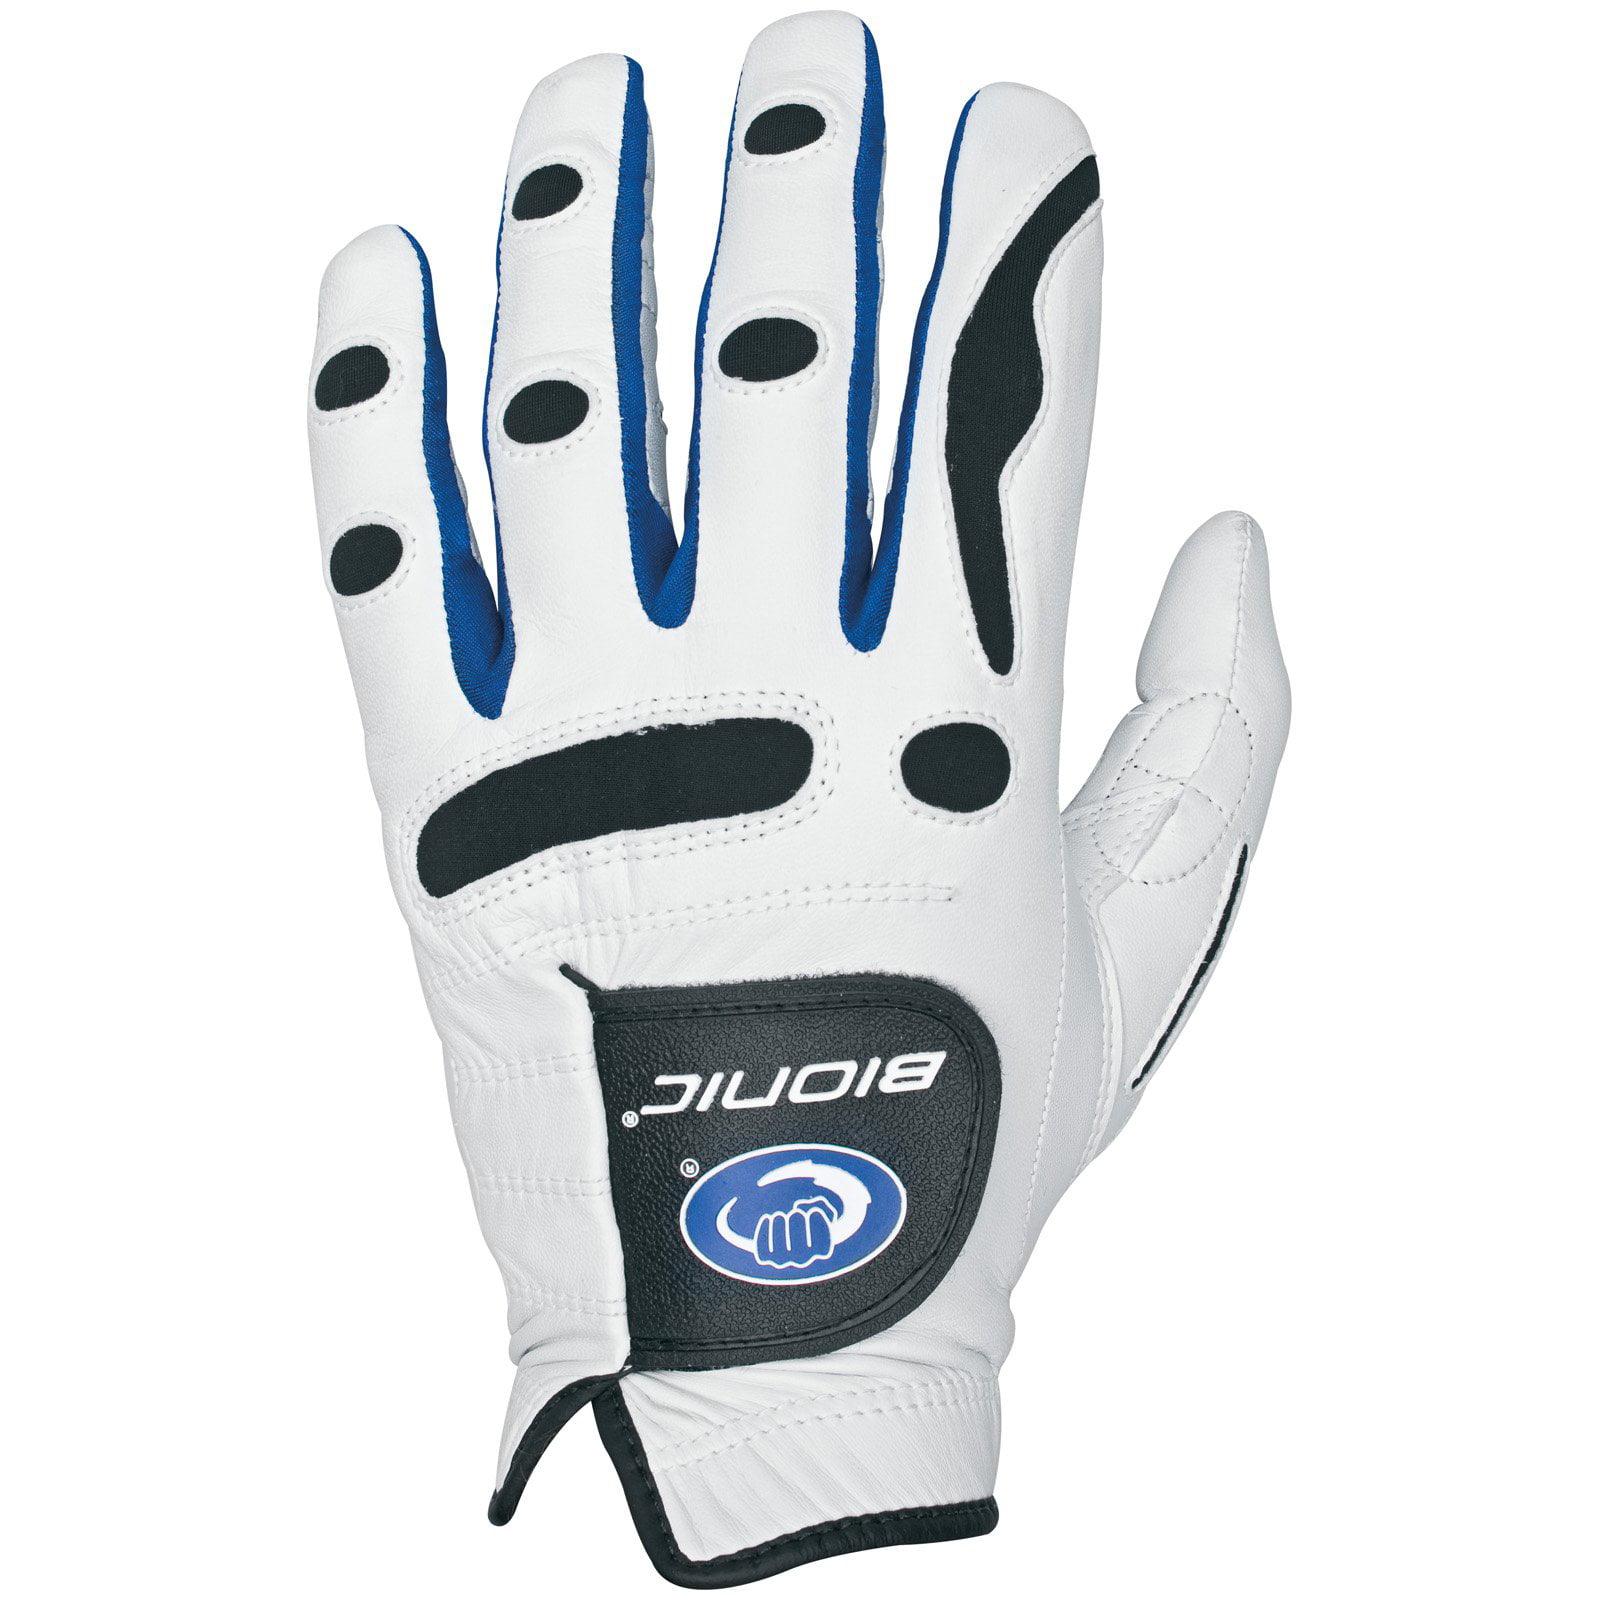 Bionic Men's Left Hand Performance Series Golf Glove